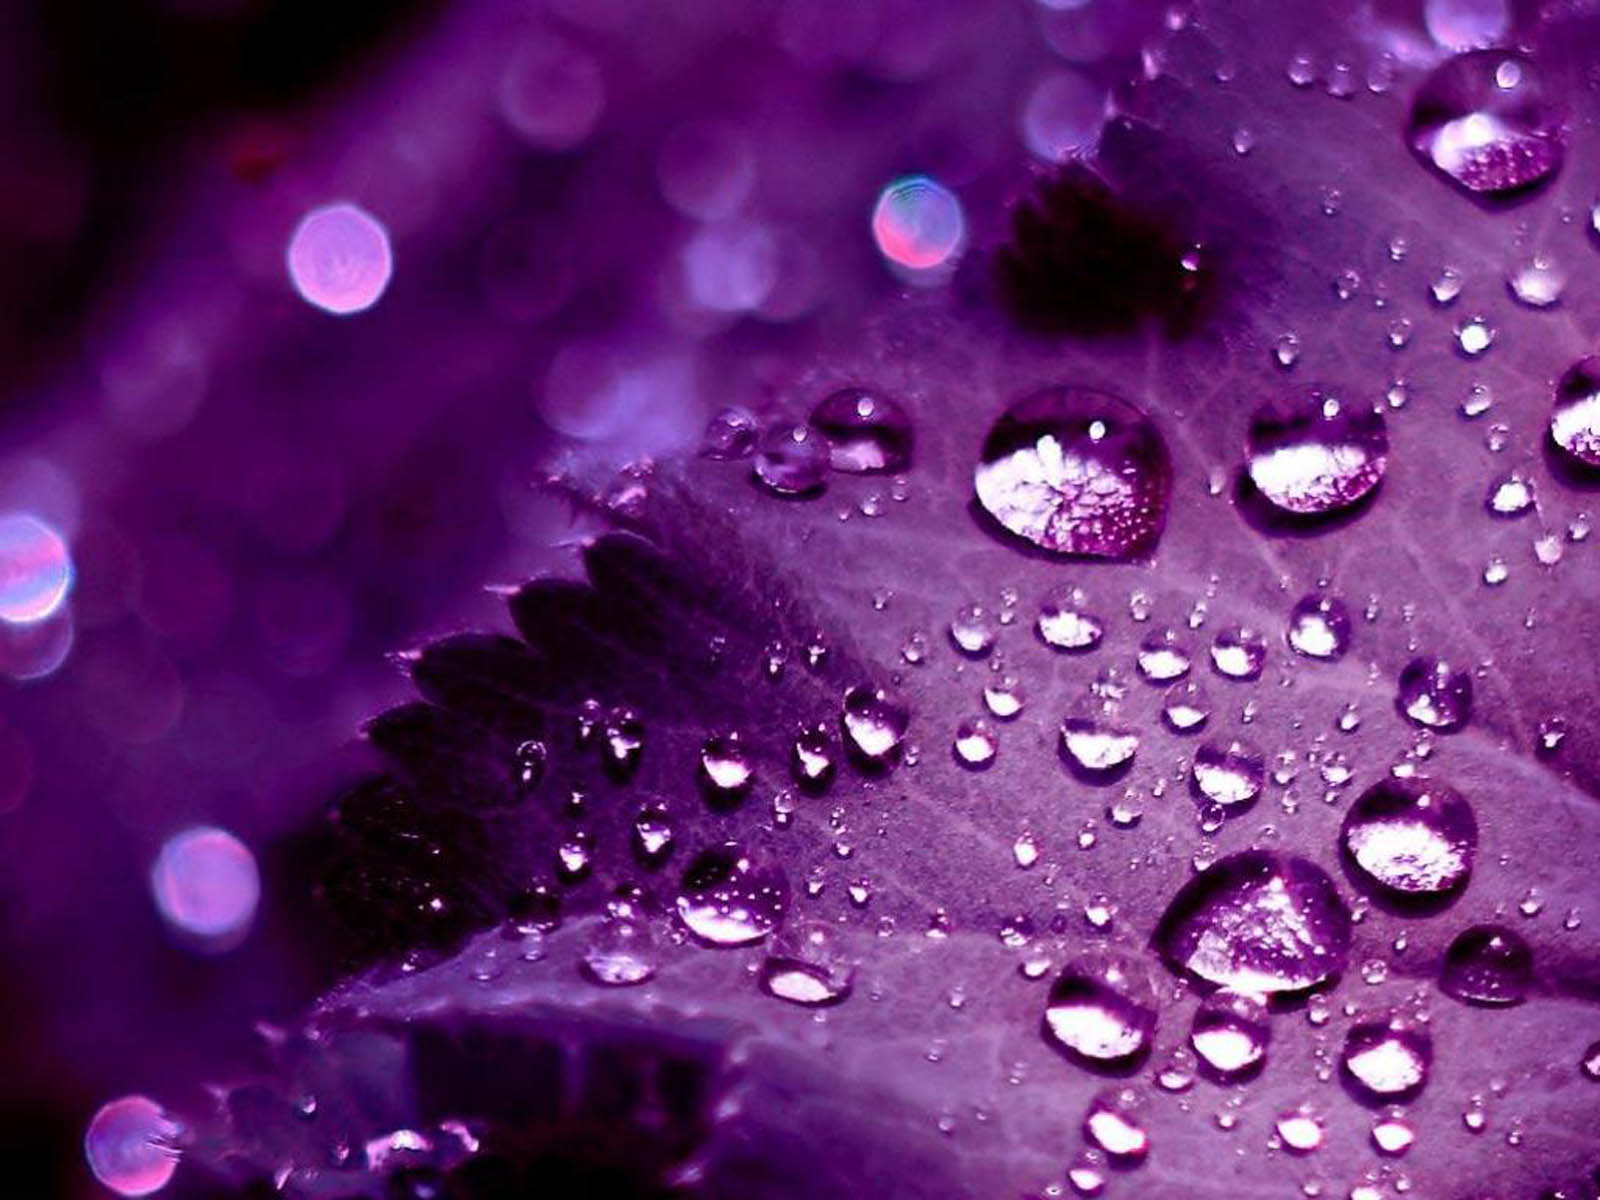 XS Wallpapers HD: 3D Purple Wallpapers